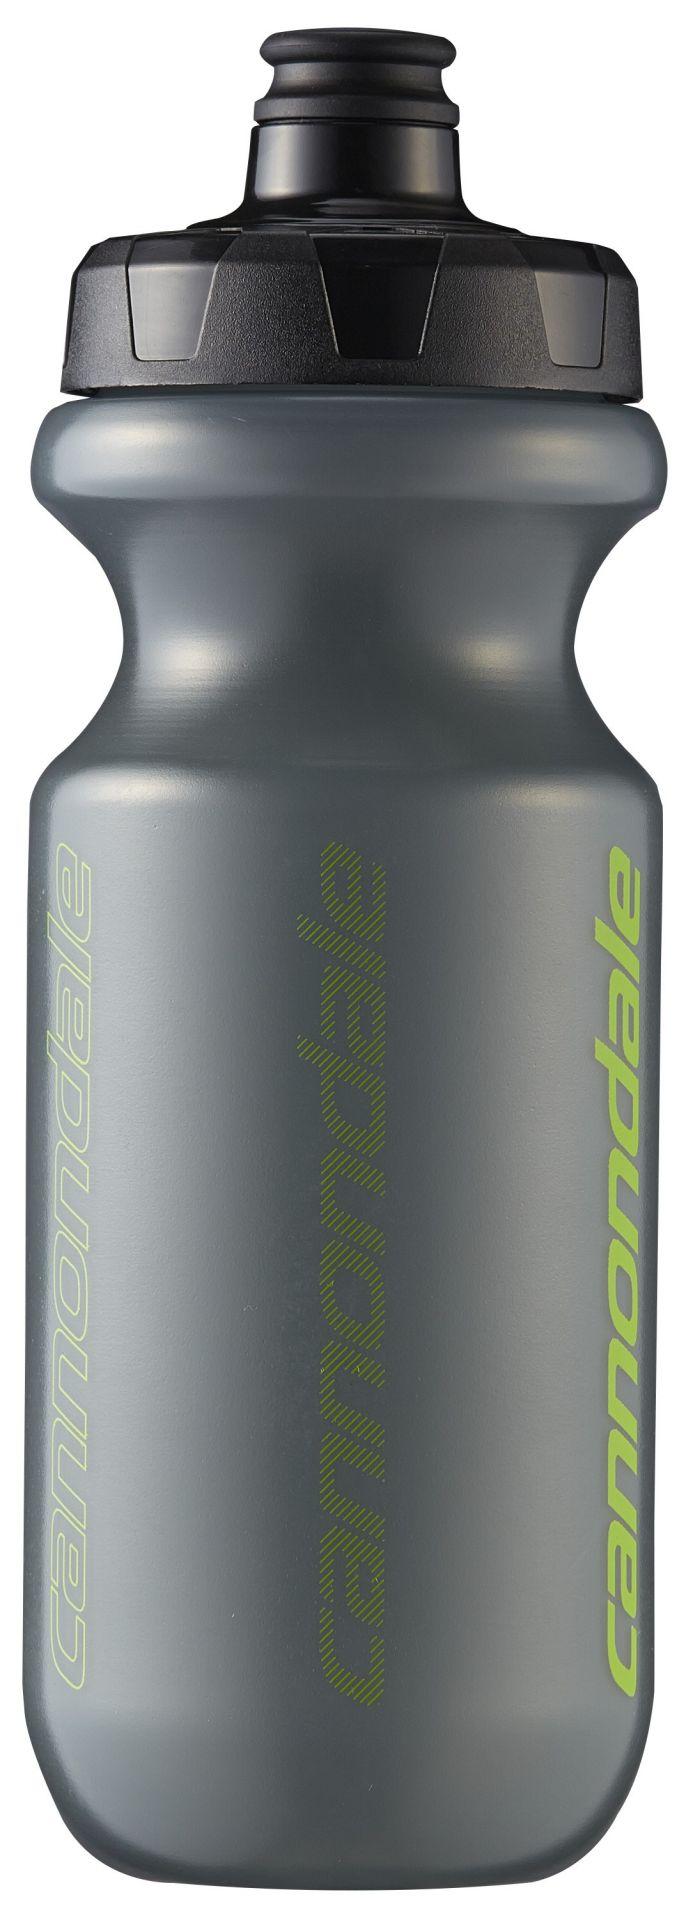 Bidon Cannondale Logo Fade Trans 500 ml Gris fumé